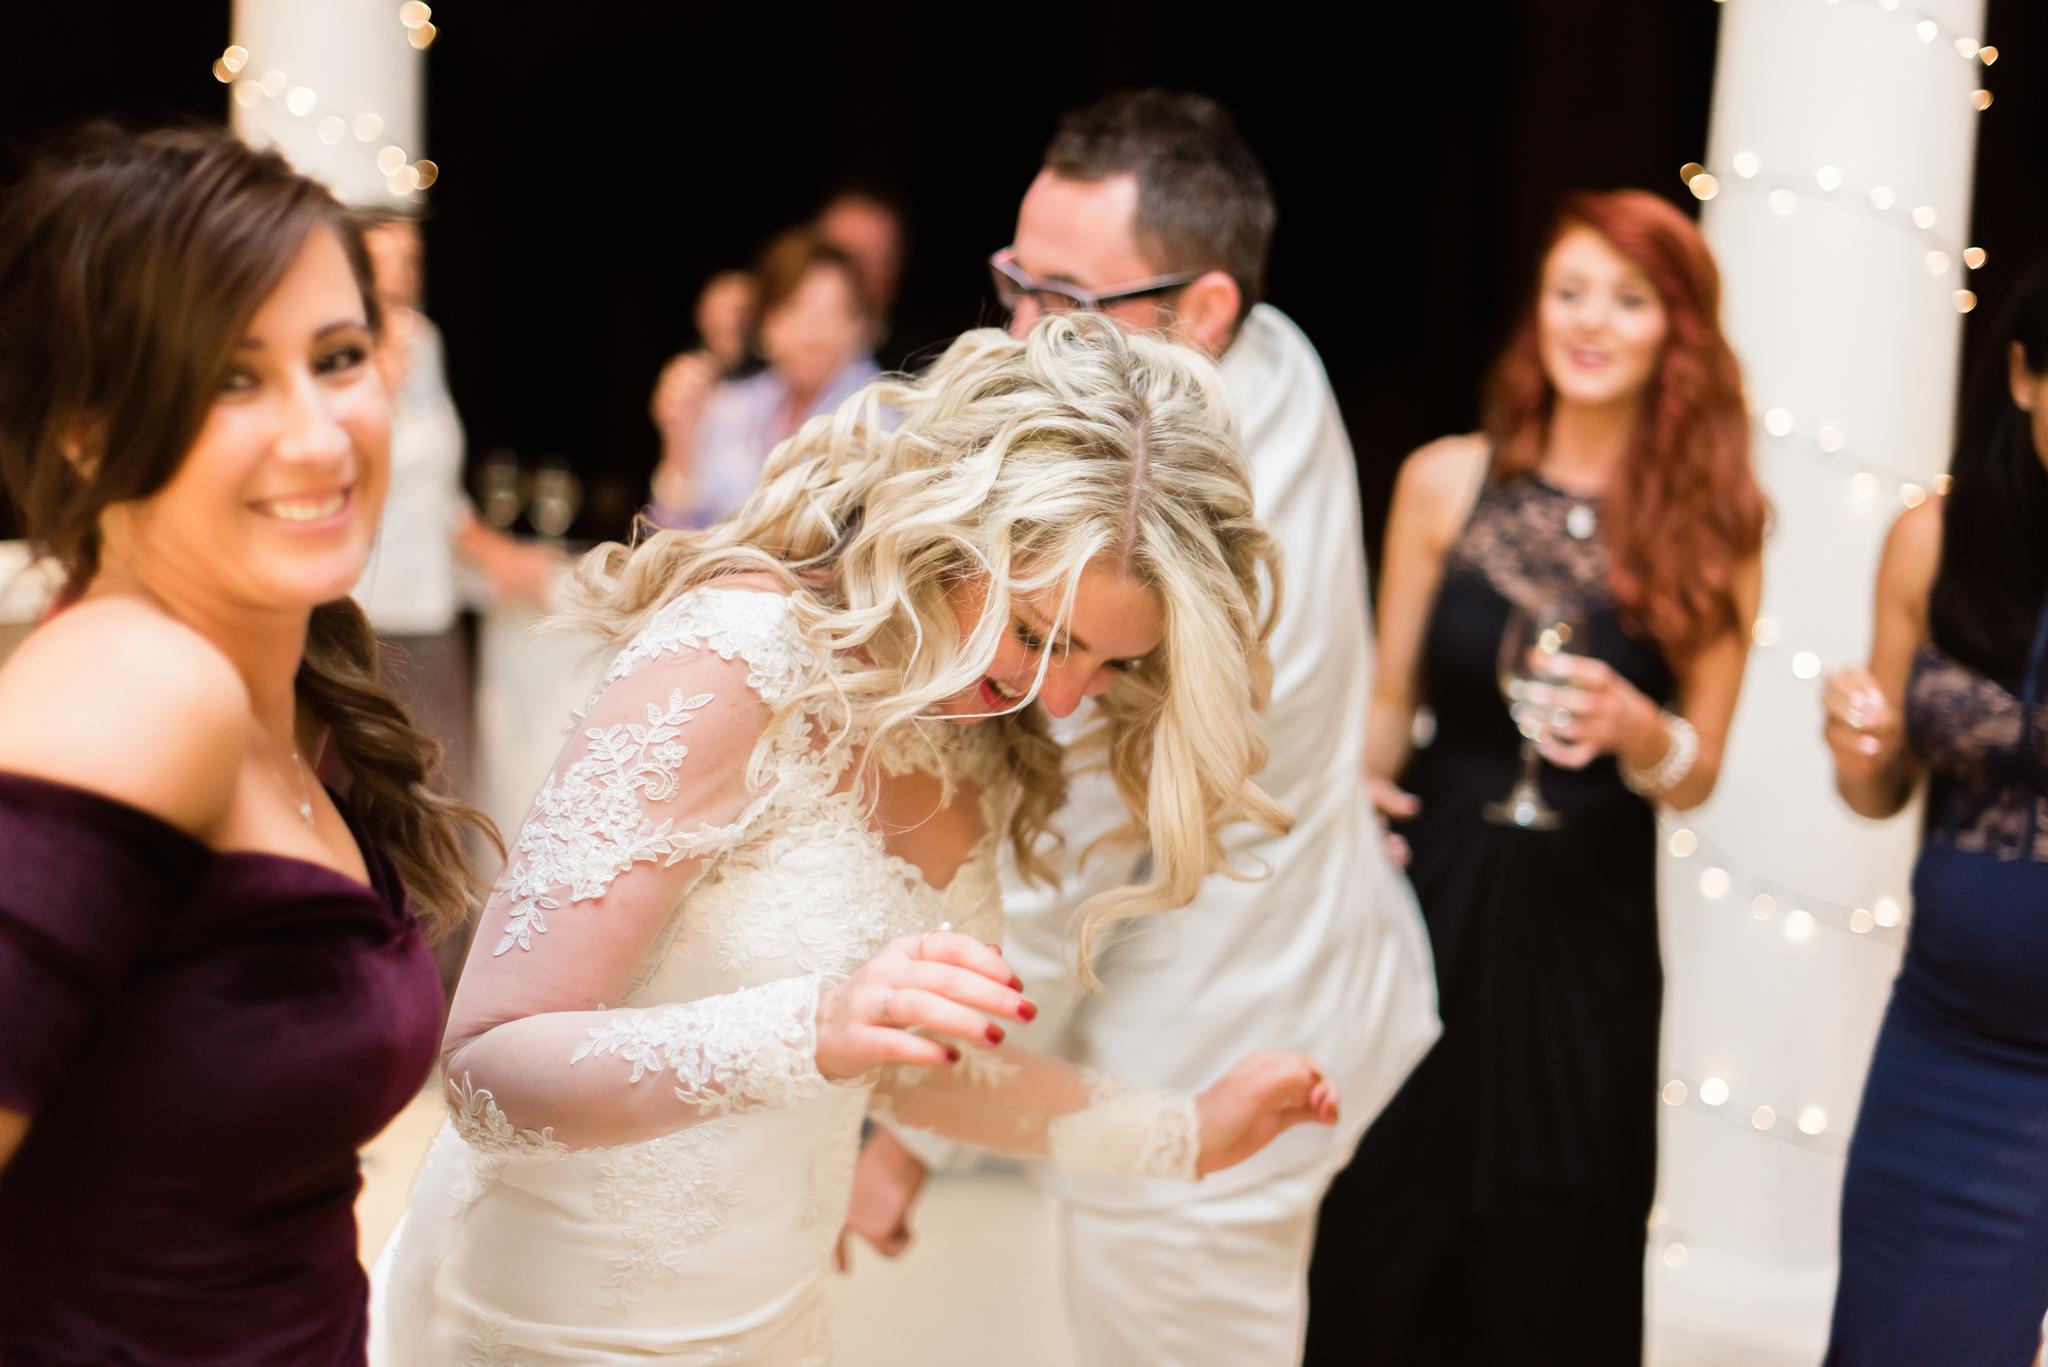 Angelique_Smith_Photography_Pieter&Yvonne_Wedding-546.jpg